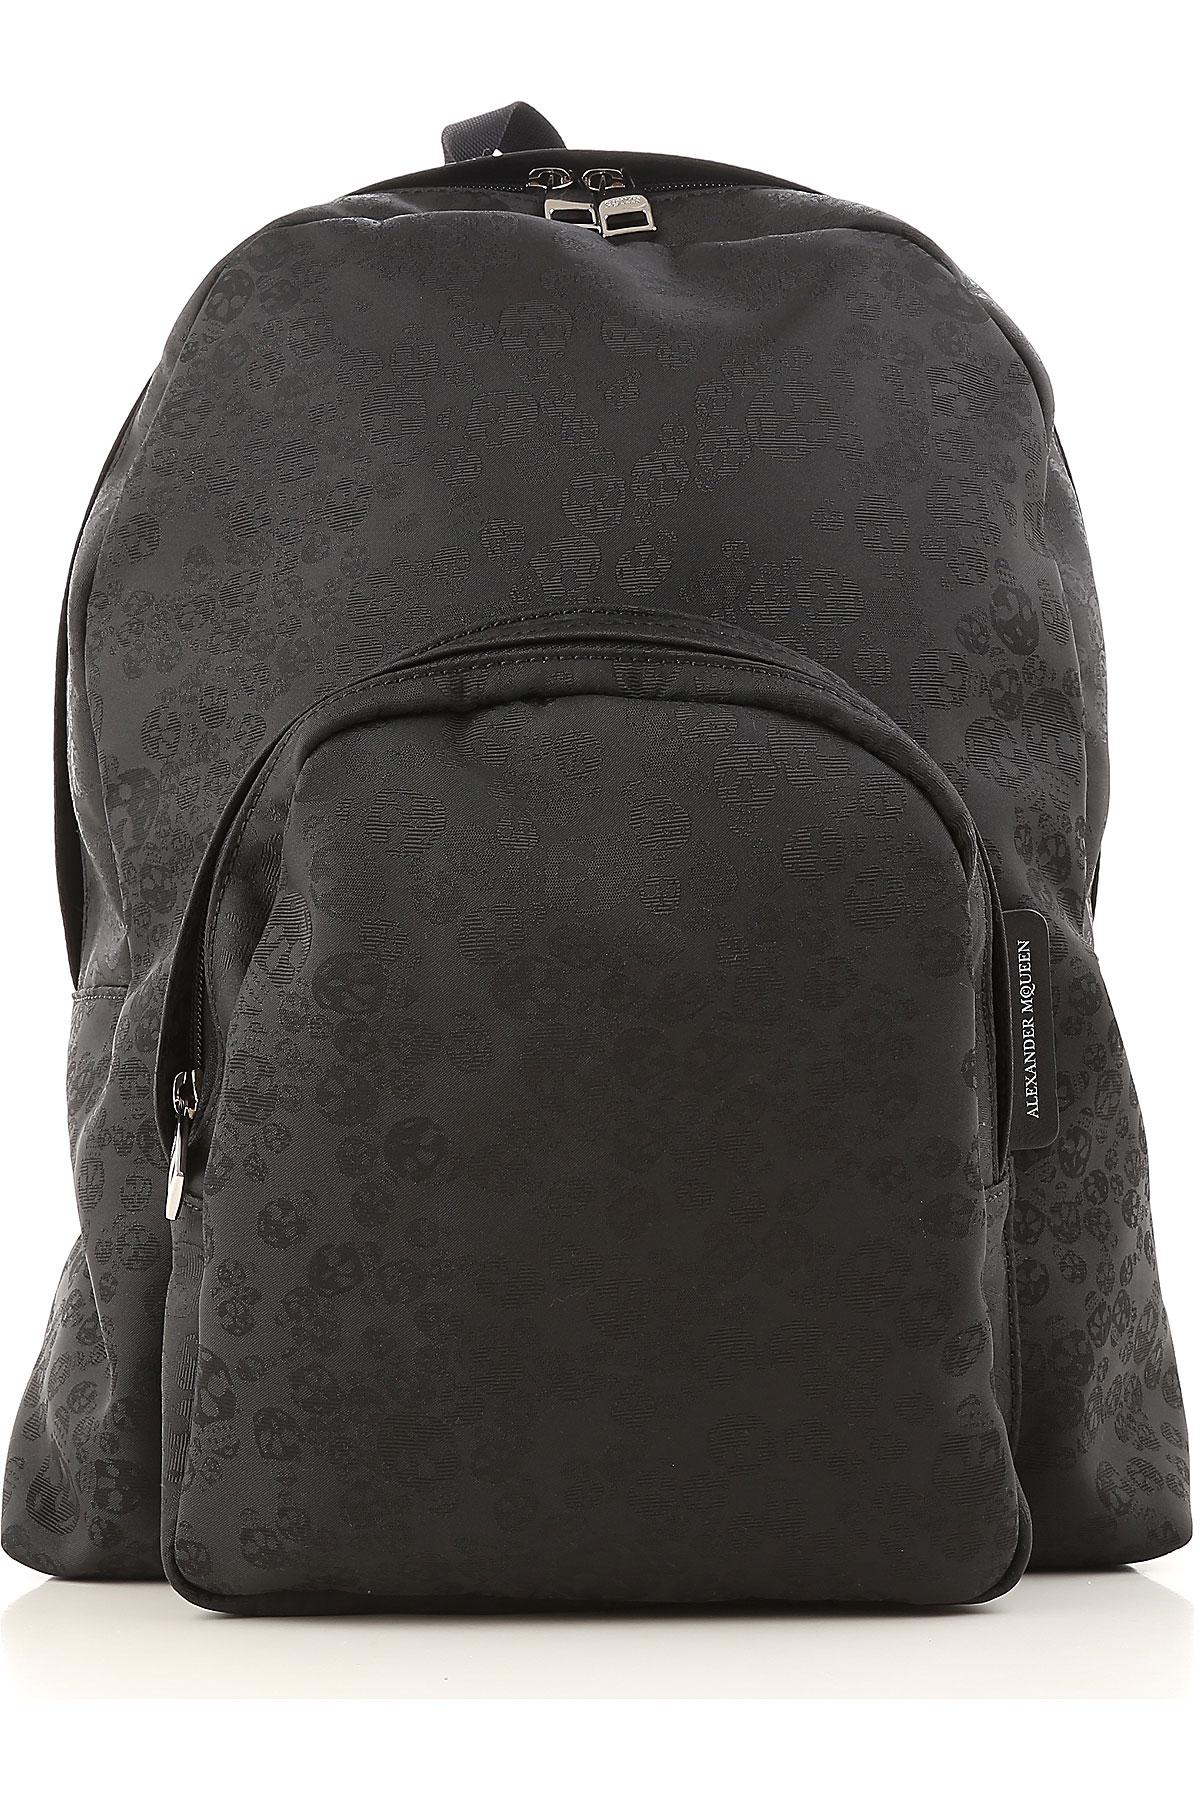 Image of Alexander McQueen Backpack for Men, Black, Fabric, 2017